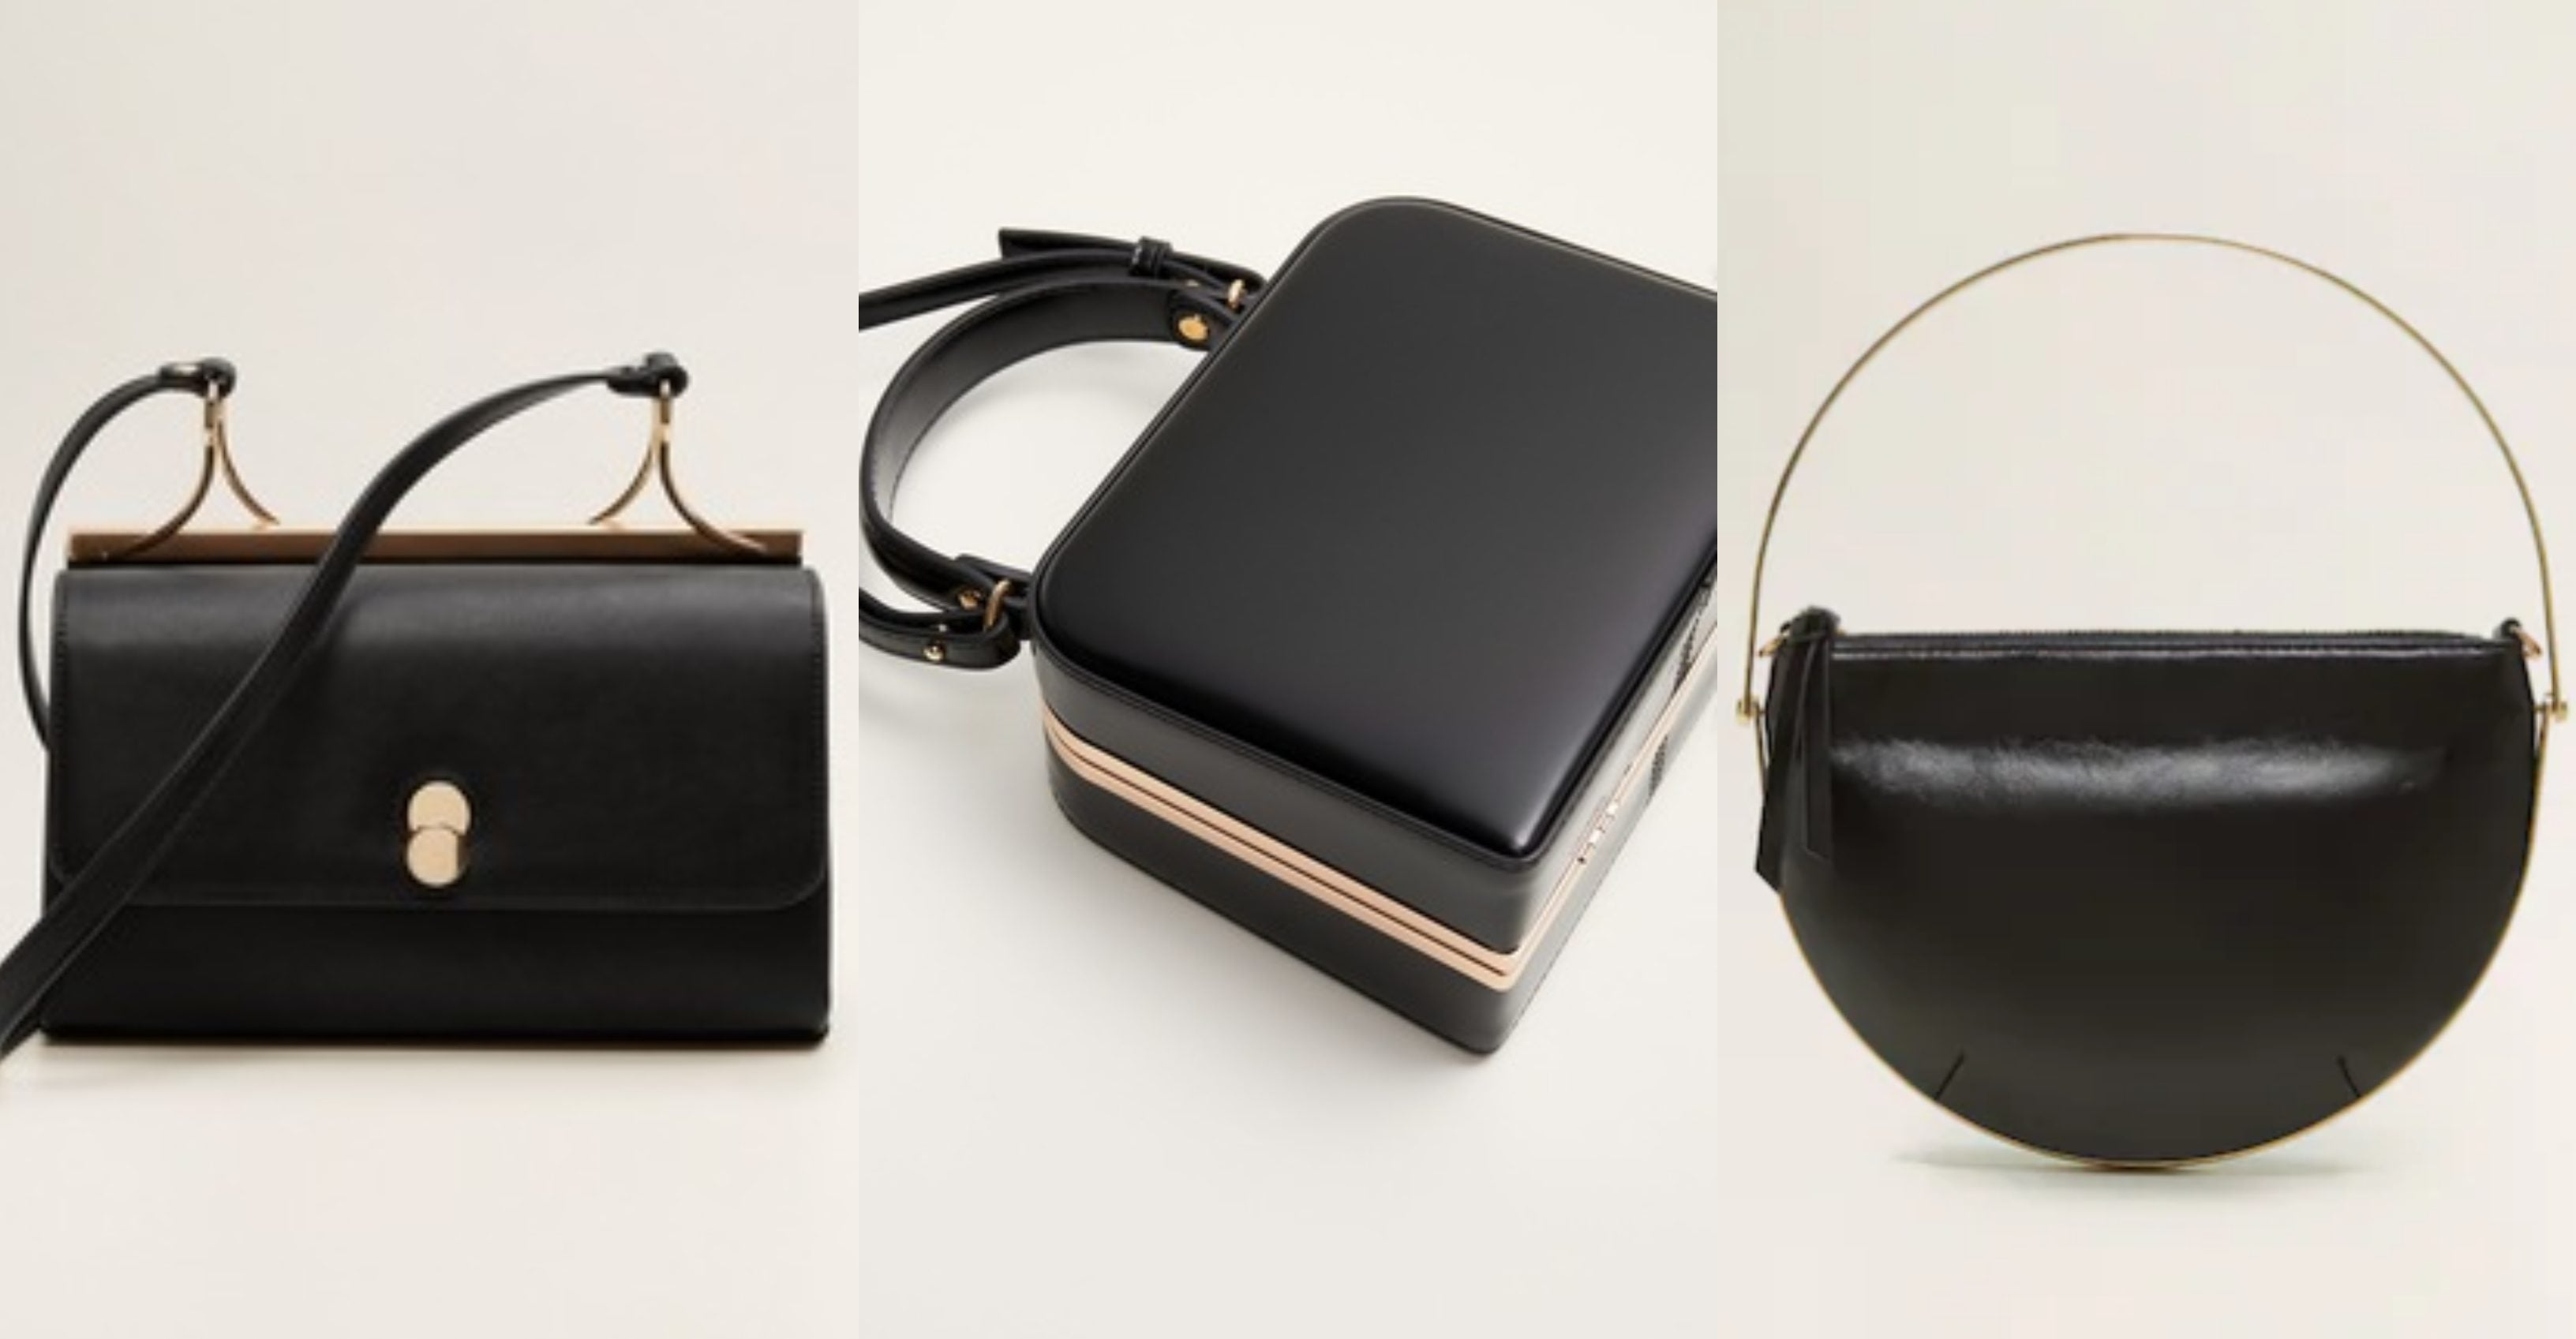 Klasične crne torbe s neobičnim metalnim akcentom